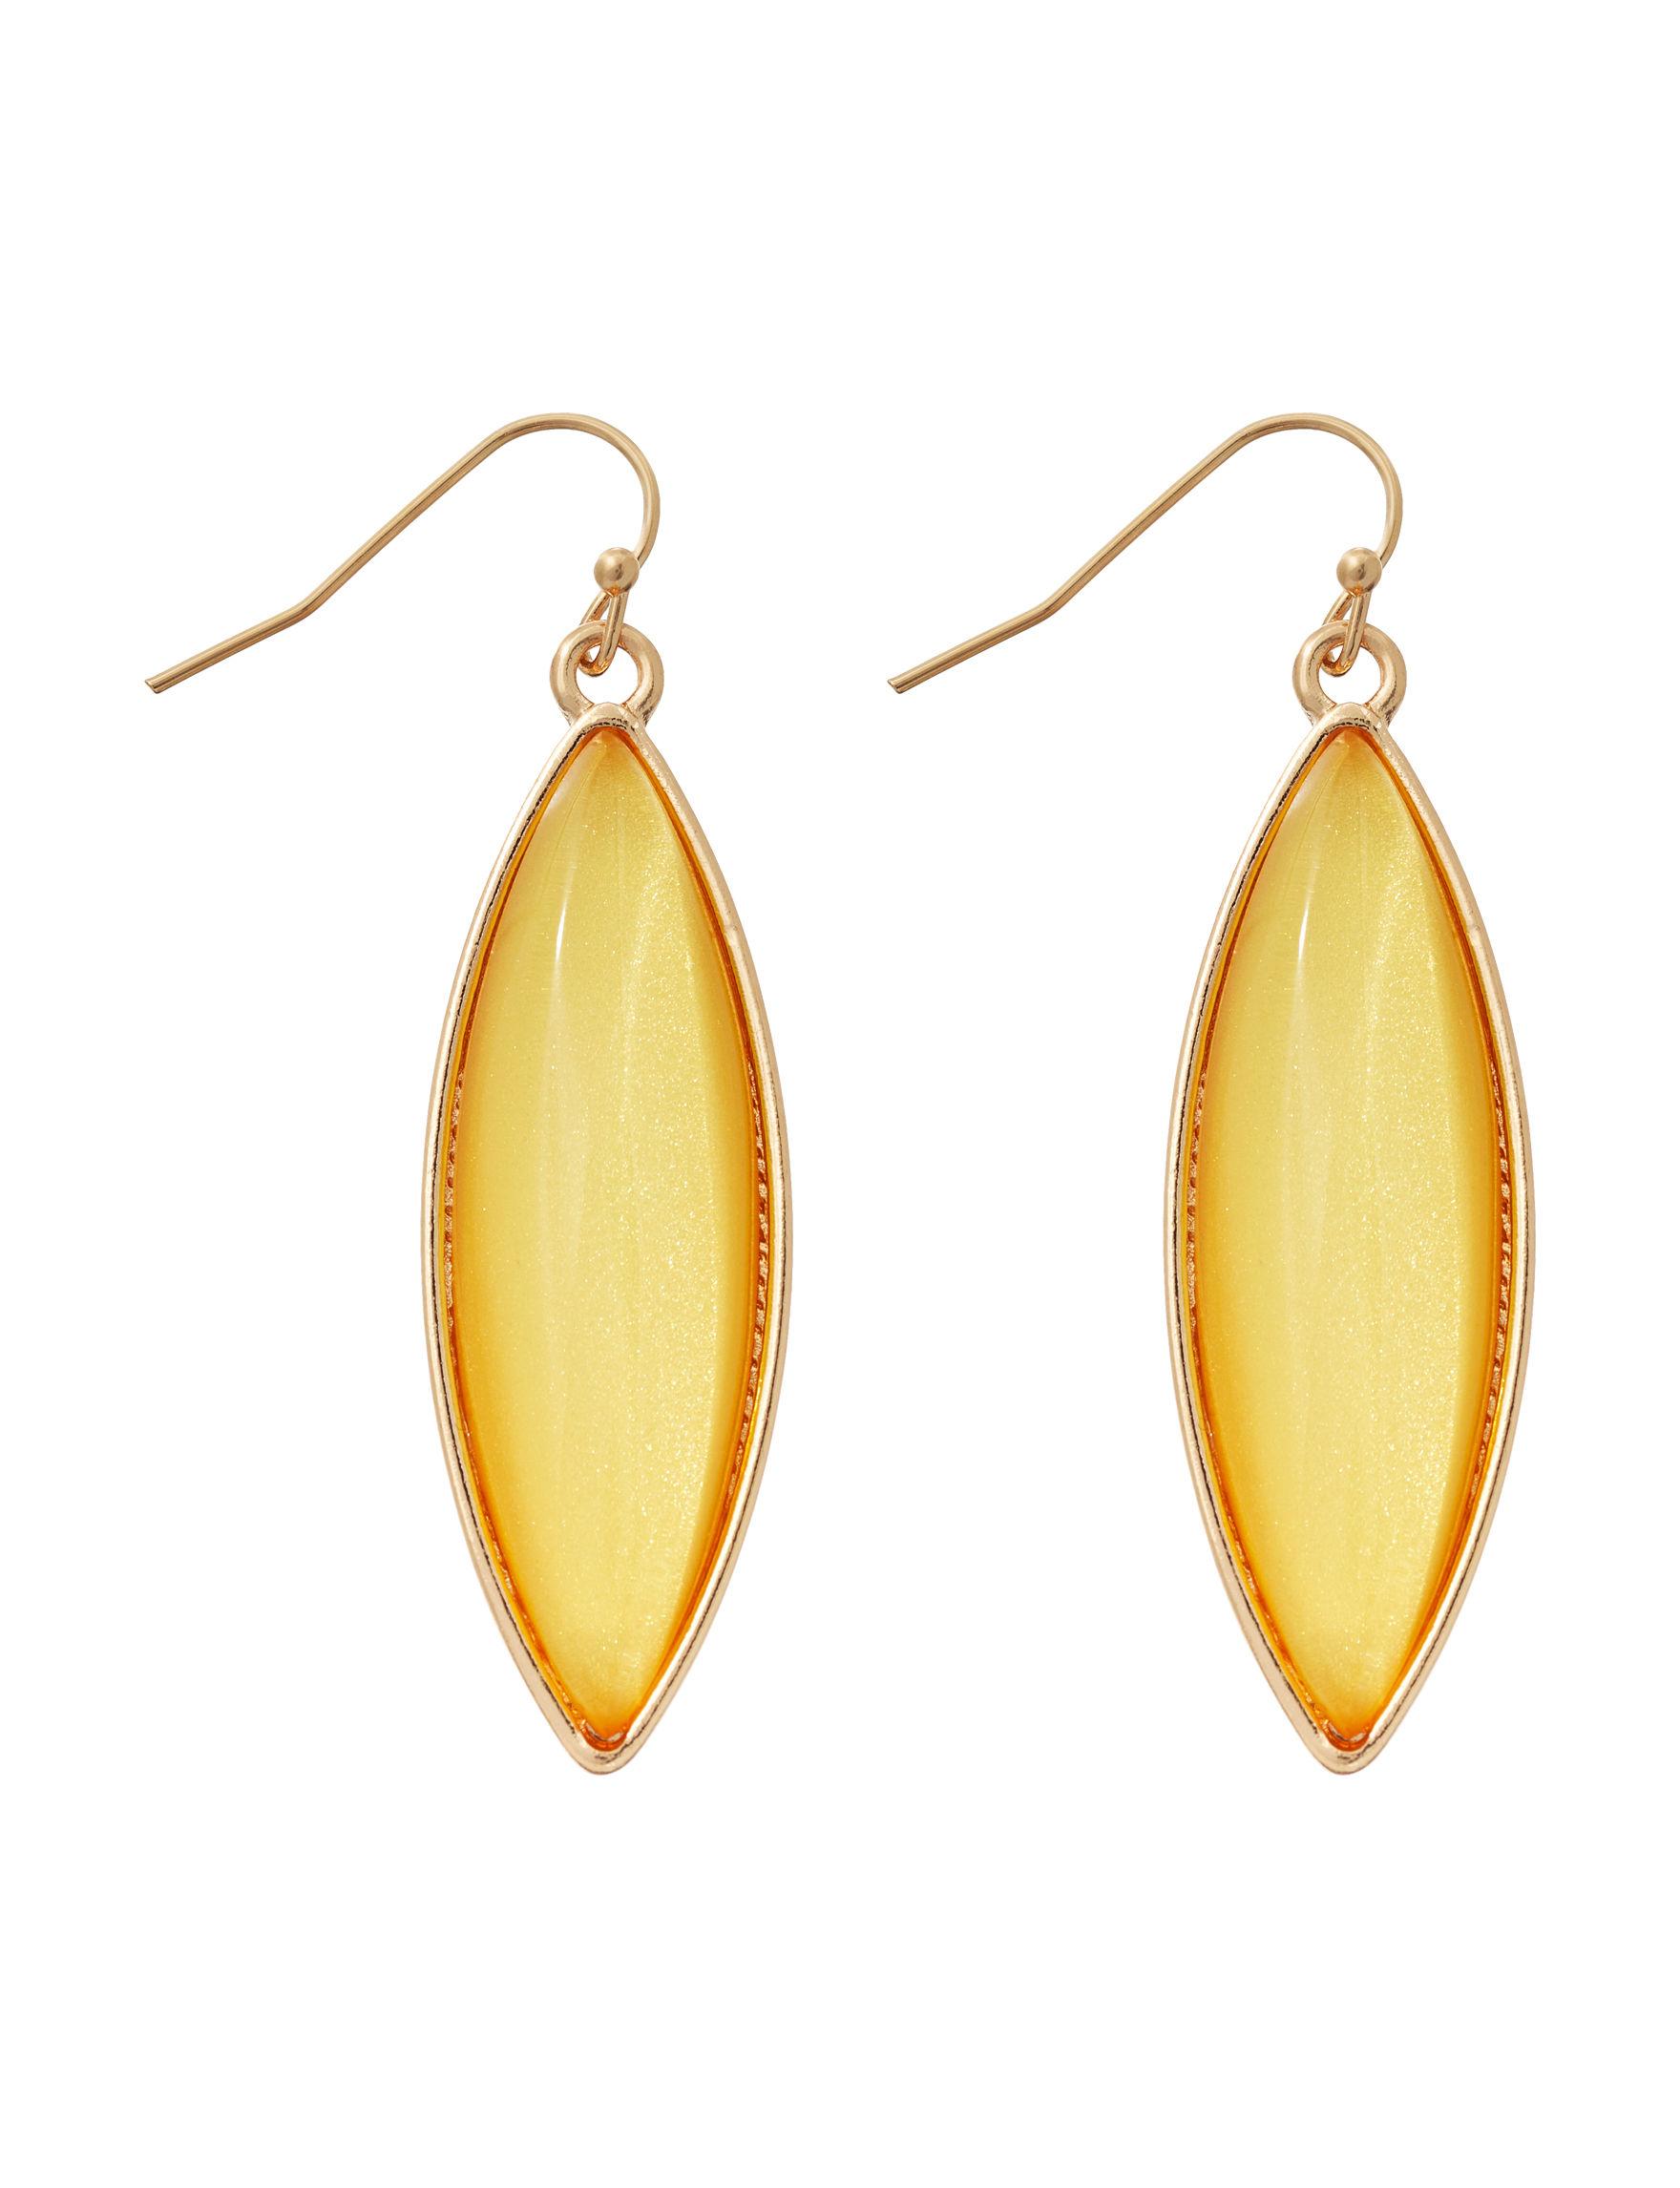 Hannah Yellow Drops Earrings Fashion Jewelry